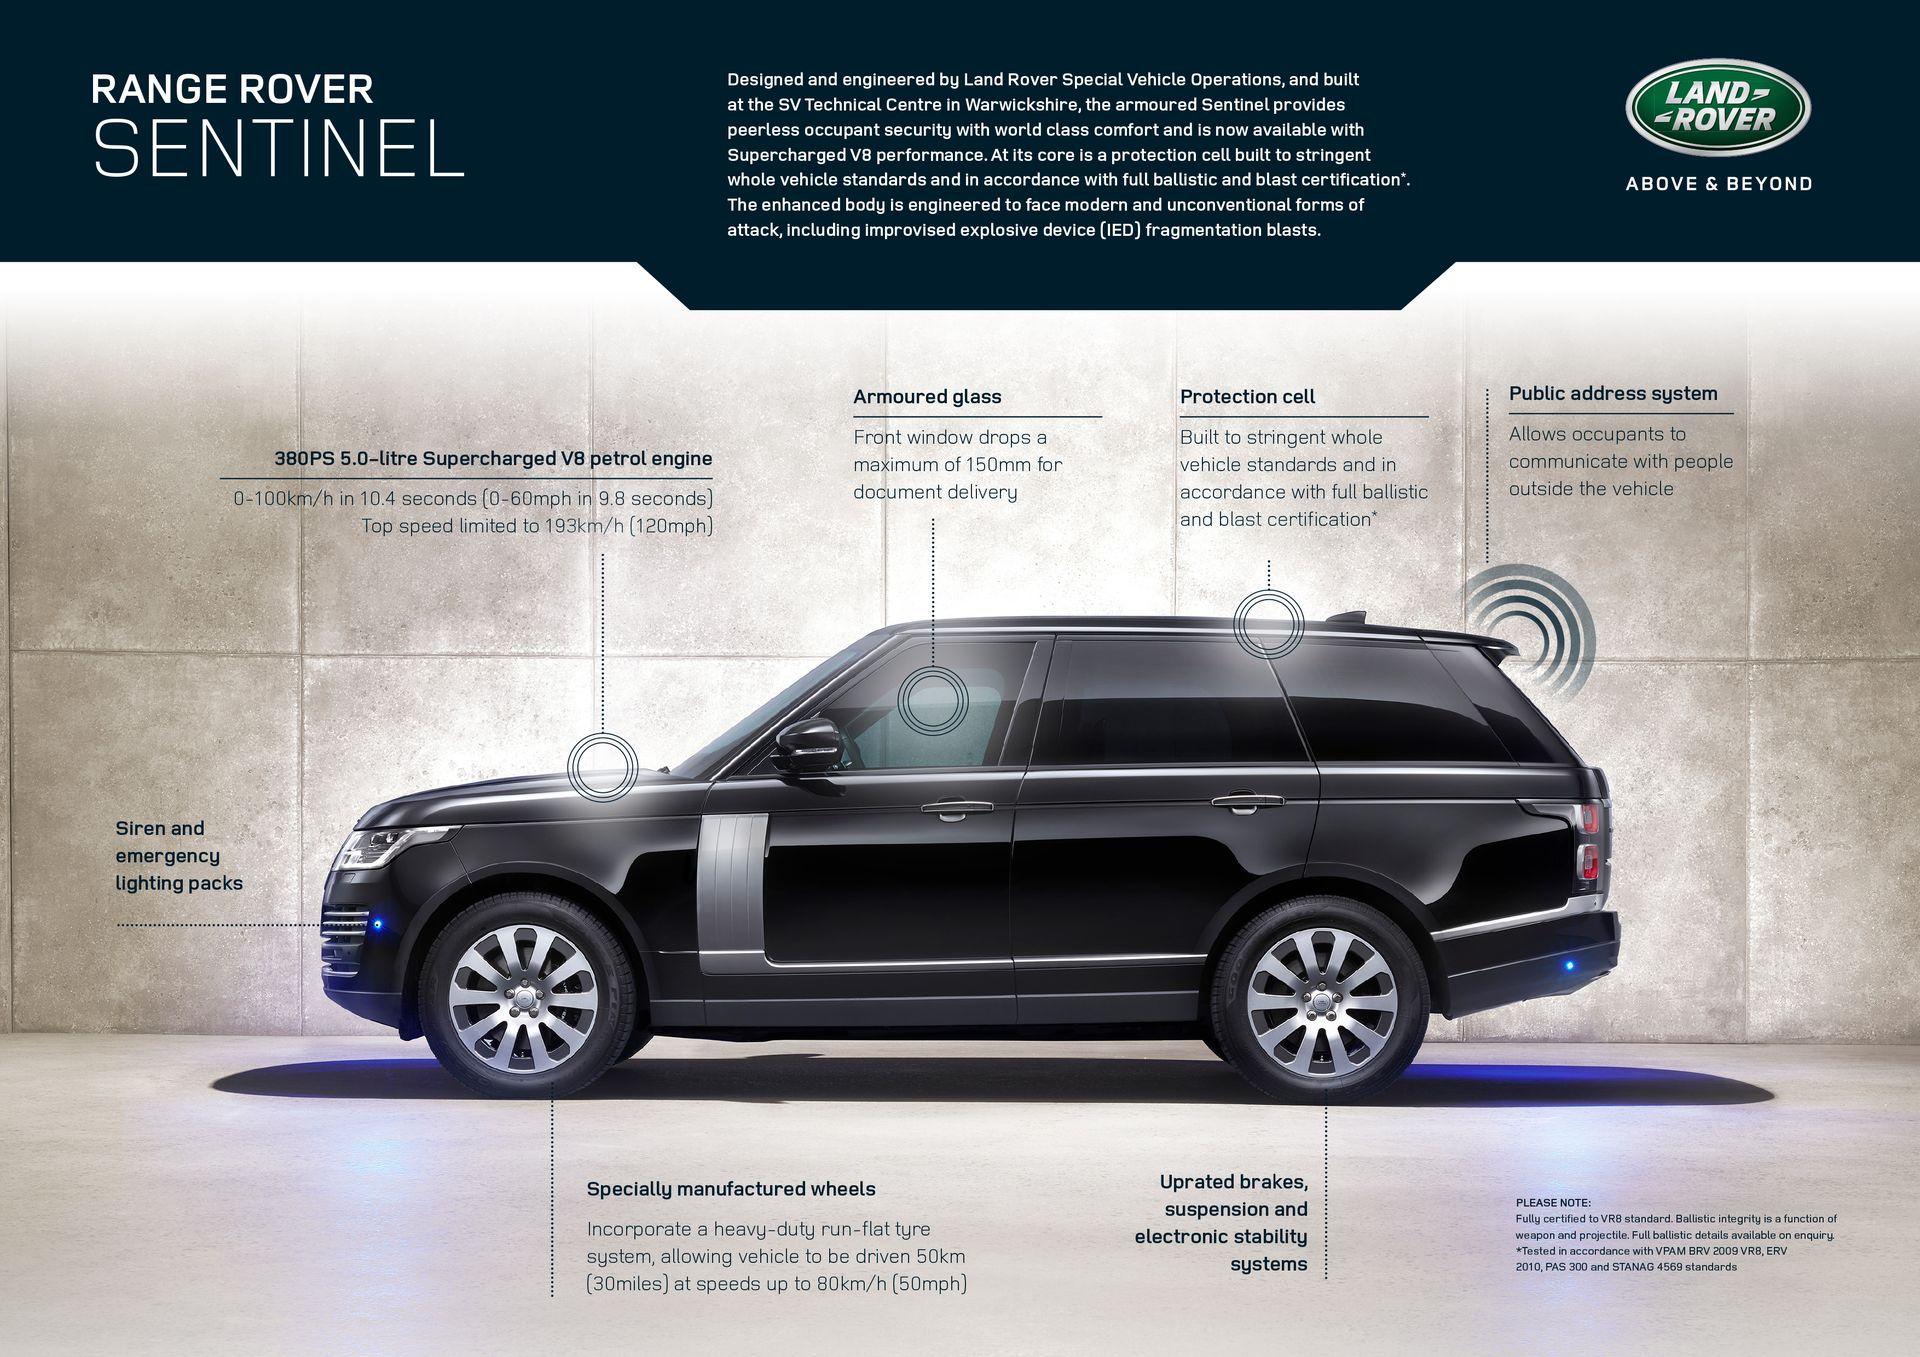 Range Rover Sentinel 2019 1